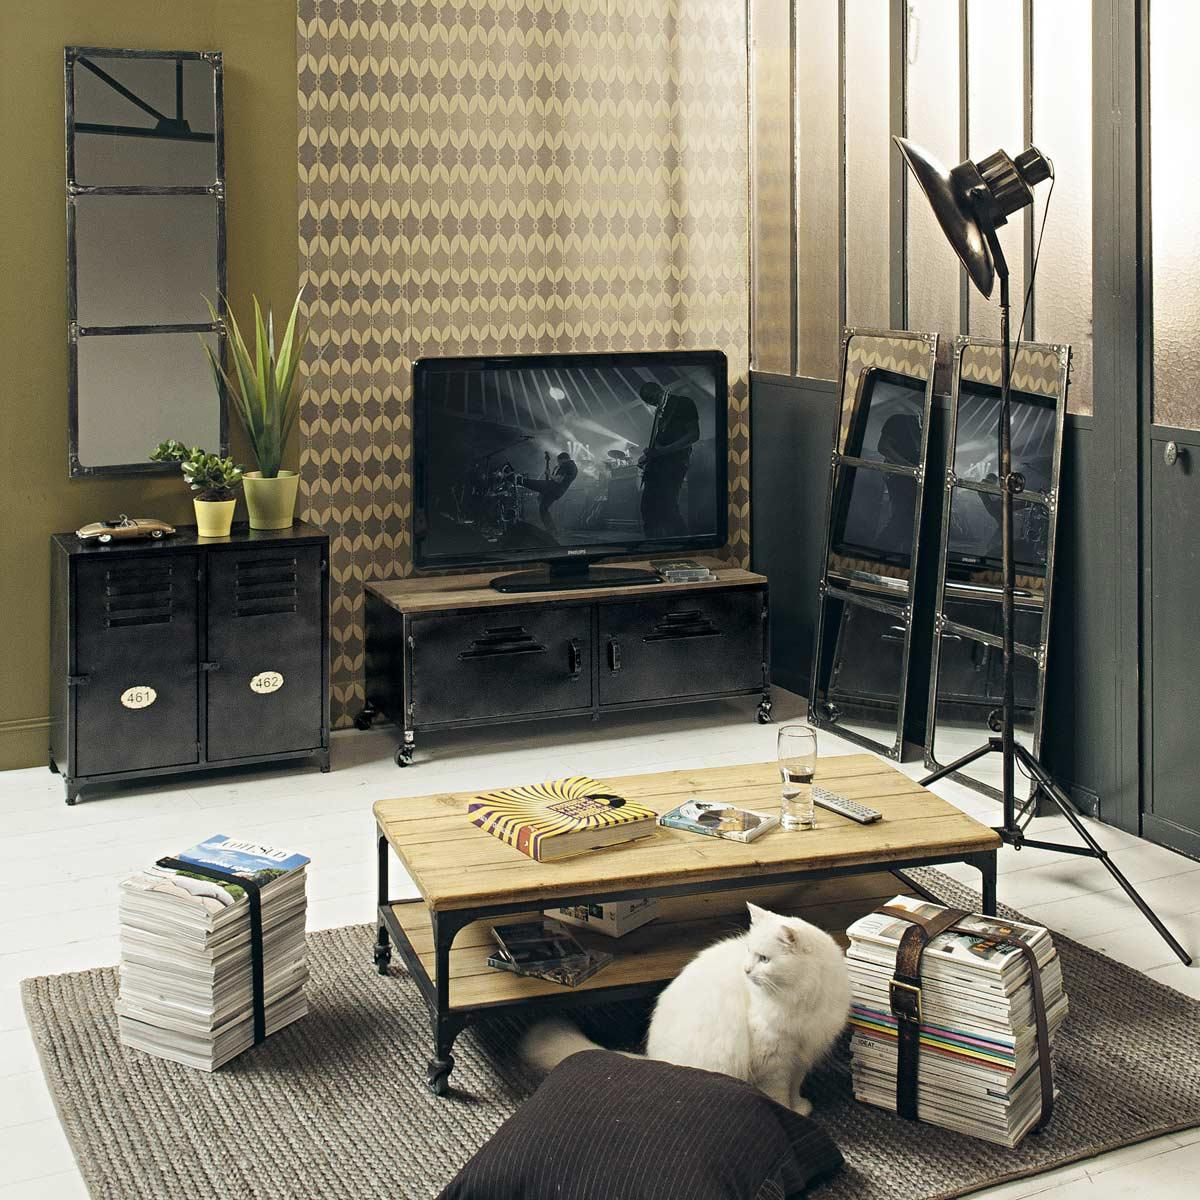 roll tv lowboard im industrial stil aus metall und tanne industriedesign pinterest tv hifi. Black Bedroom Furniture Sets. Home Design Ideas